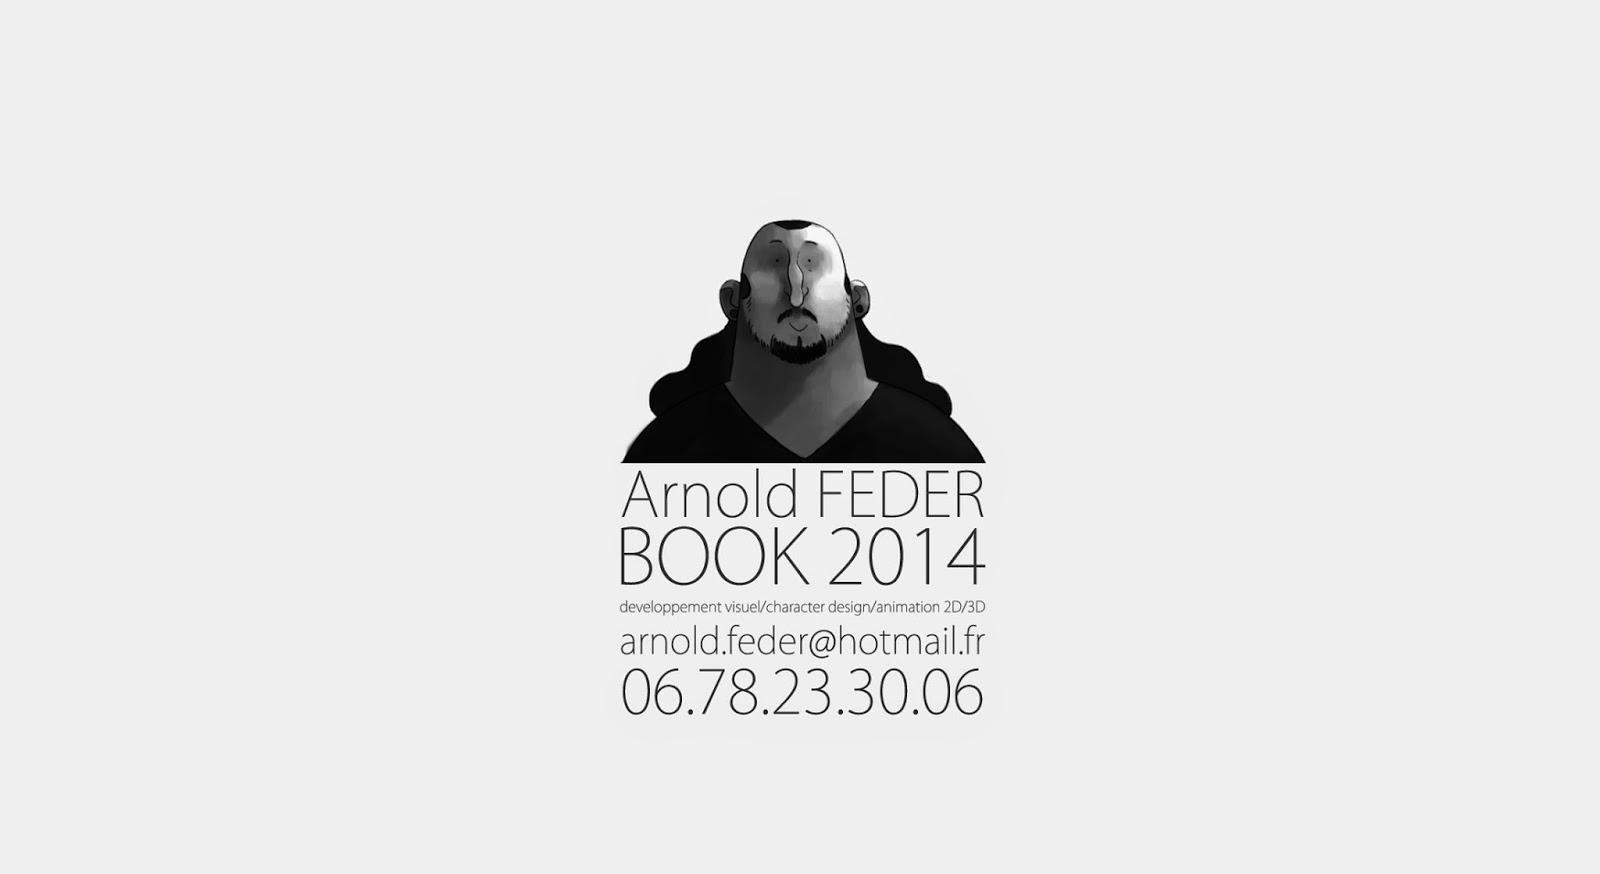 http://arnoldfederbook.blogspot.fr/